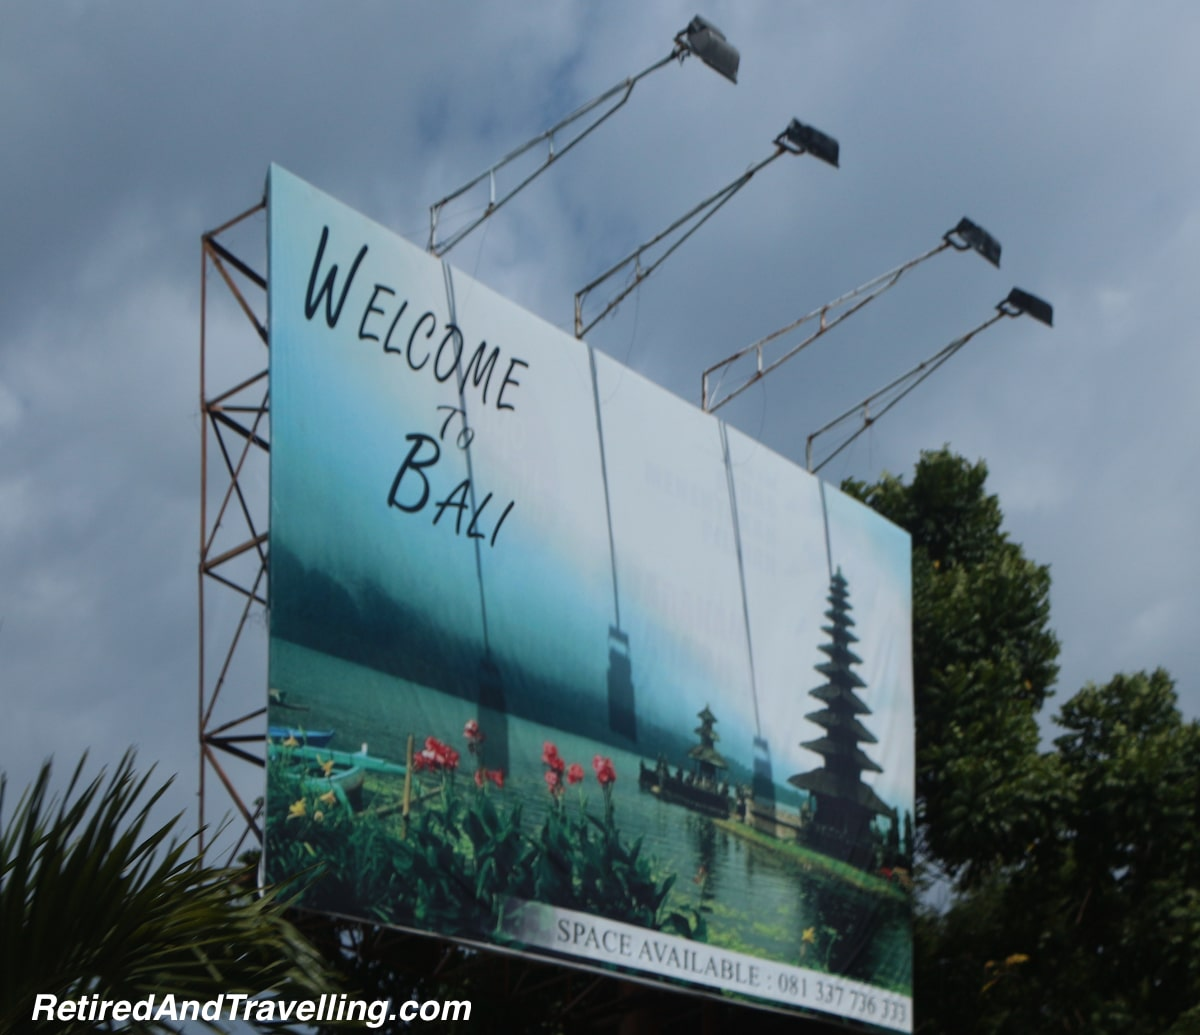 Welcome to Bali - Staying At Jimbaran Bay Bali.jpg